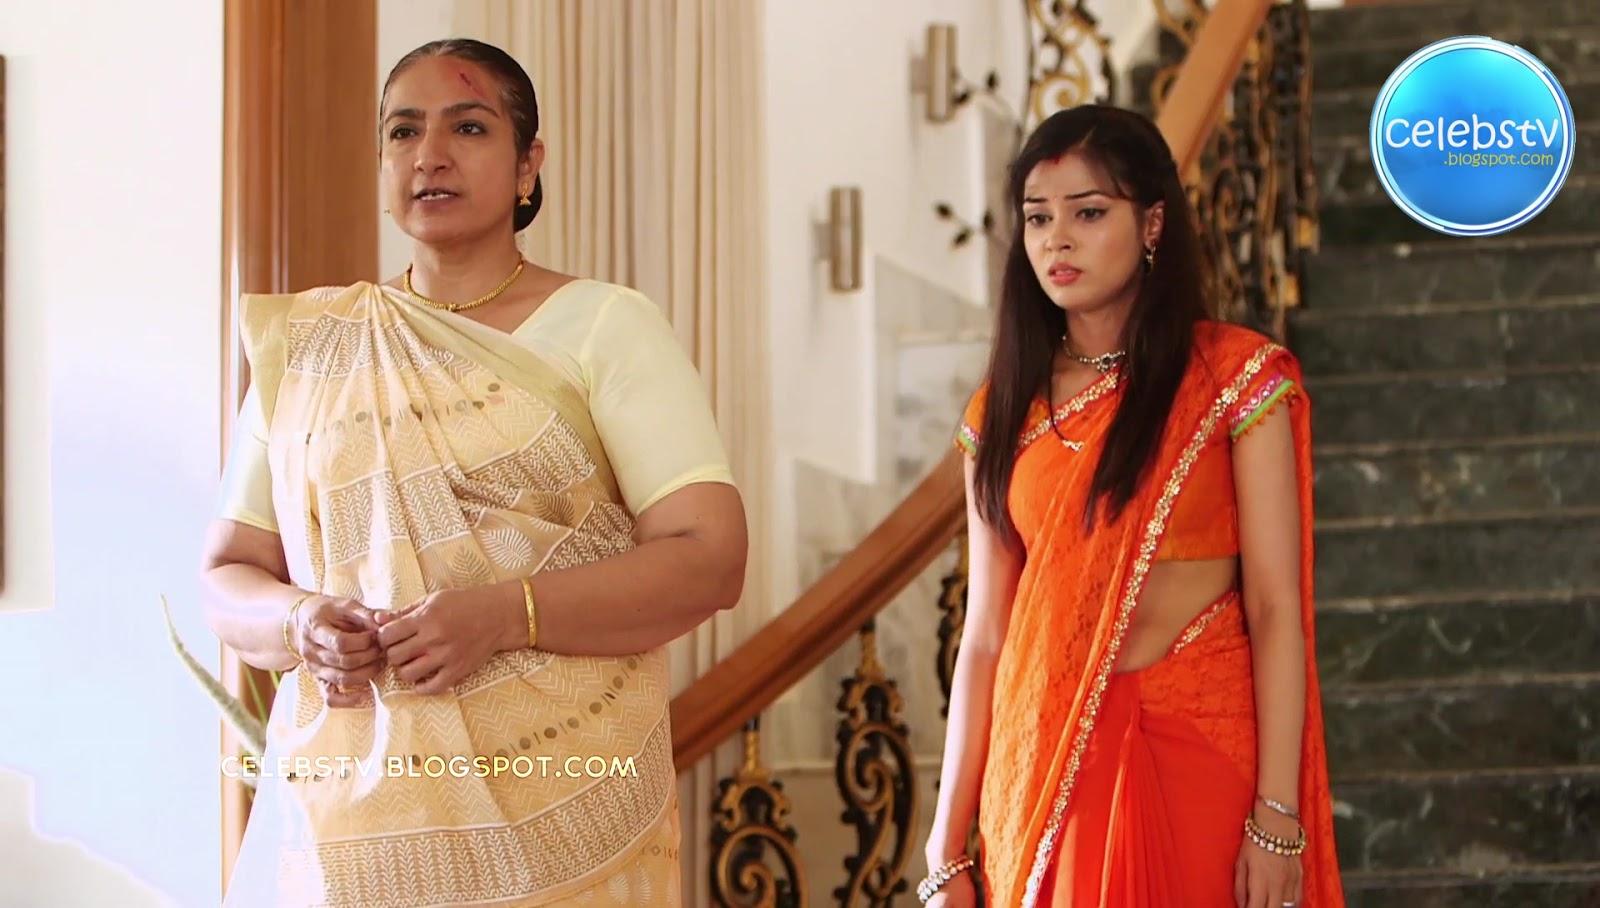 Hot Tv Serial Actress From Savdhaan India Bare Navel Show -9069